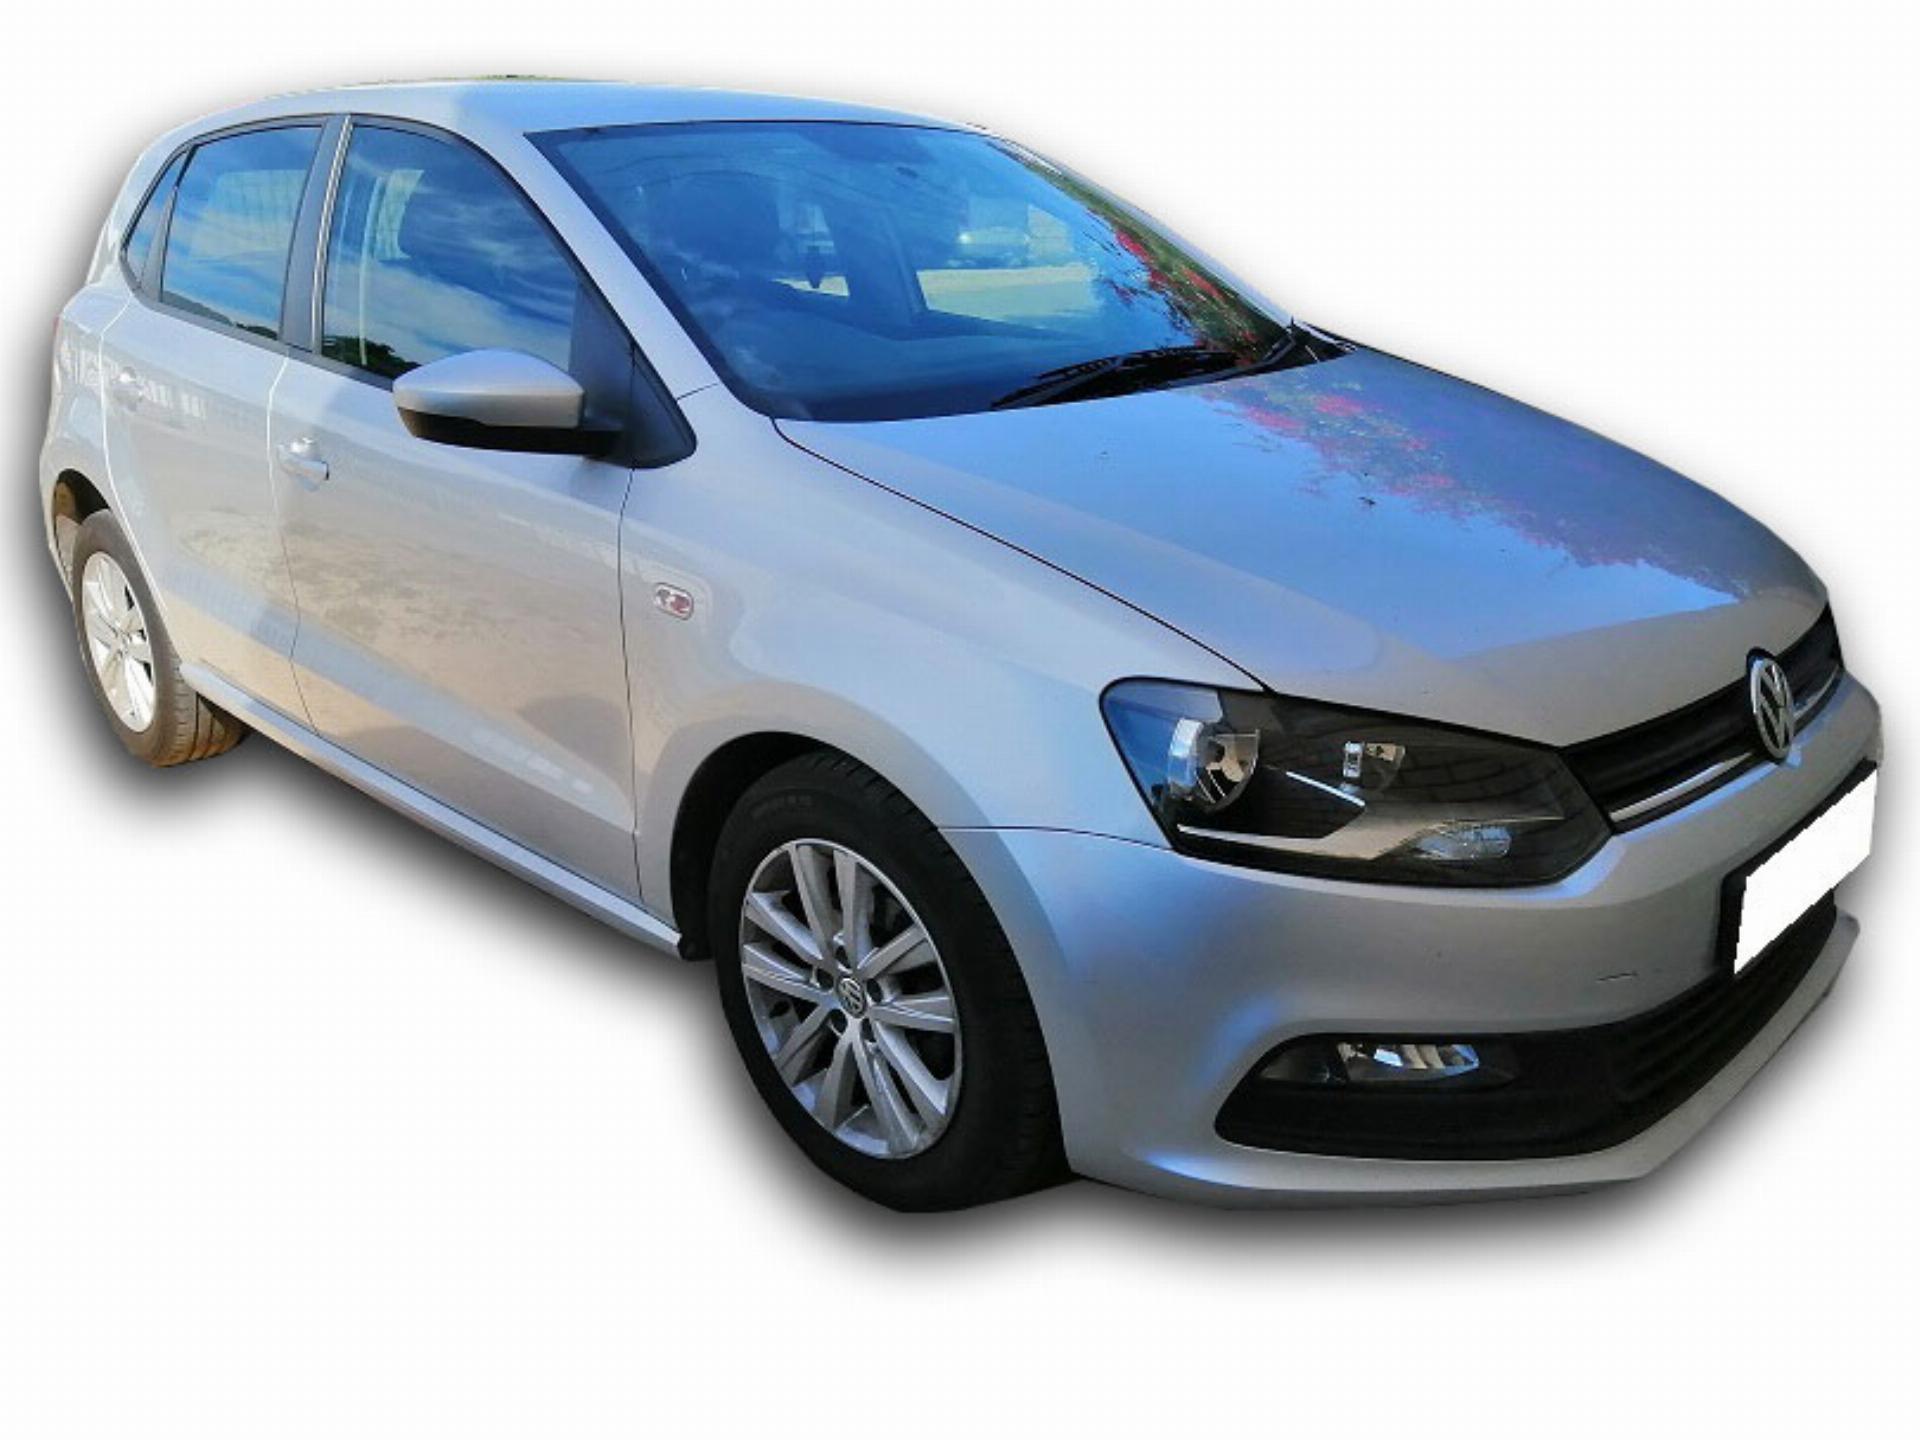 Volkswagen Polo Vivo 1.4 Comfortline